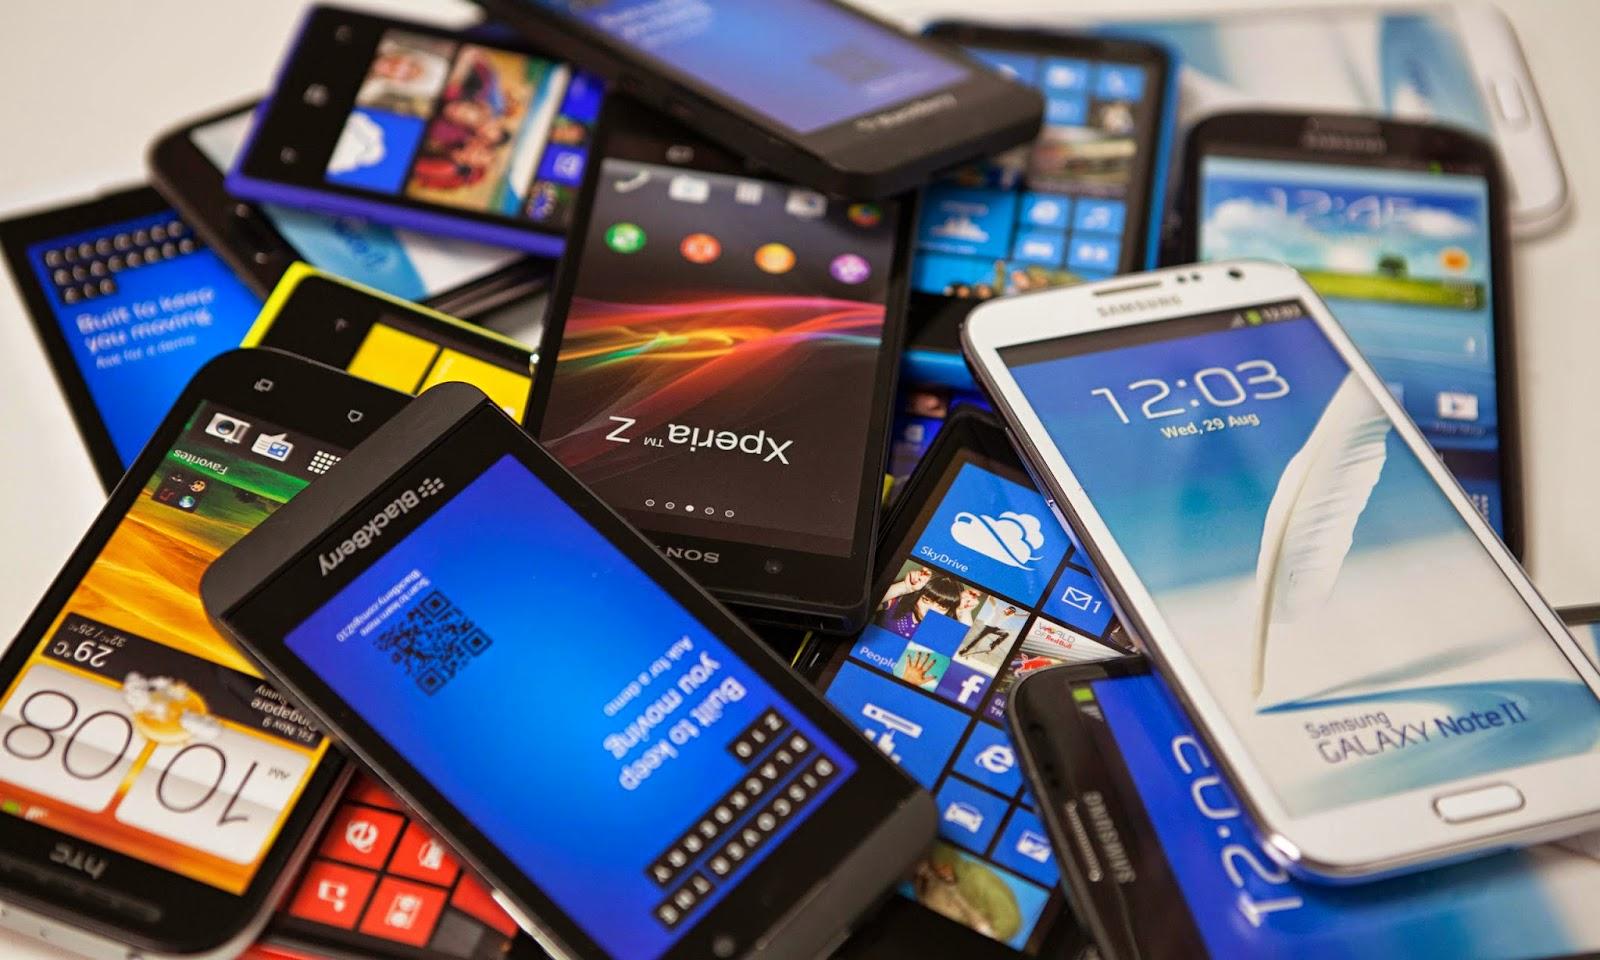 https://3.bp.blogspot.com/-AwYommZcavM/V5AKUjJPnrI/AAAAAAAAAM0/NMpBe25-qLIVWi88Jm7RC2UVnnIKogIPACLcB/s1600/tips-menjual-hp-android.jpg